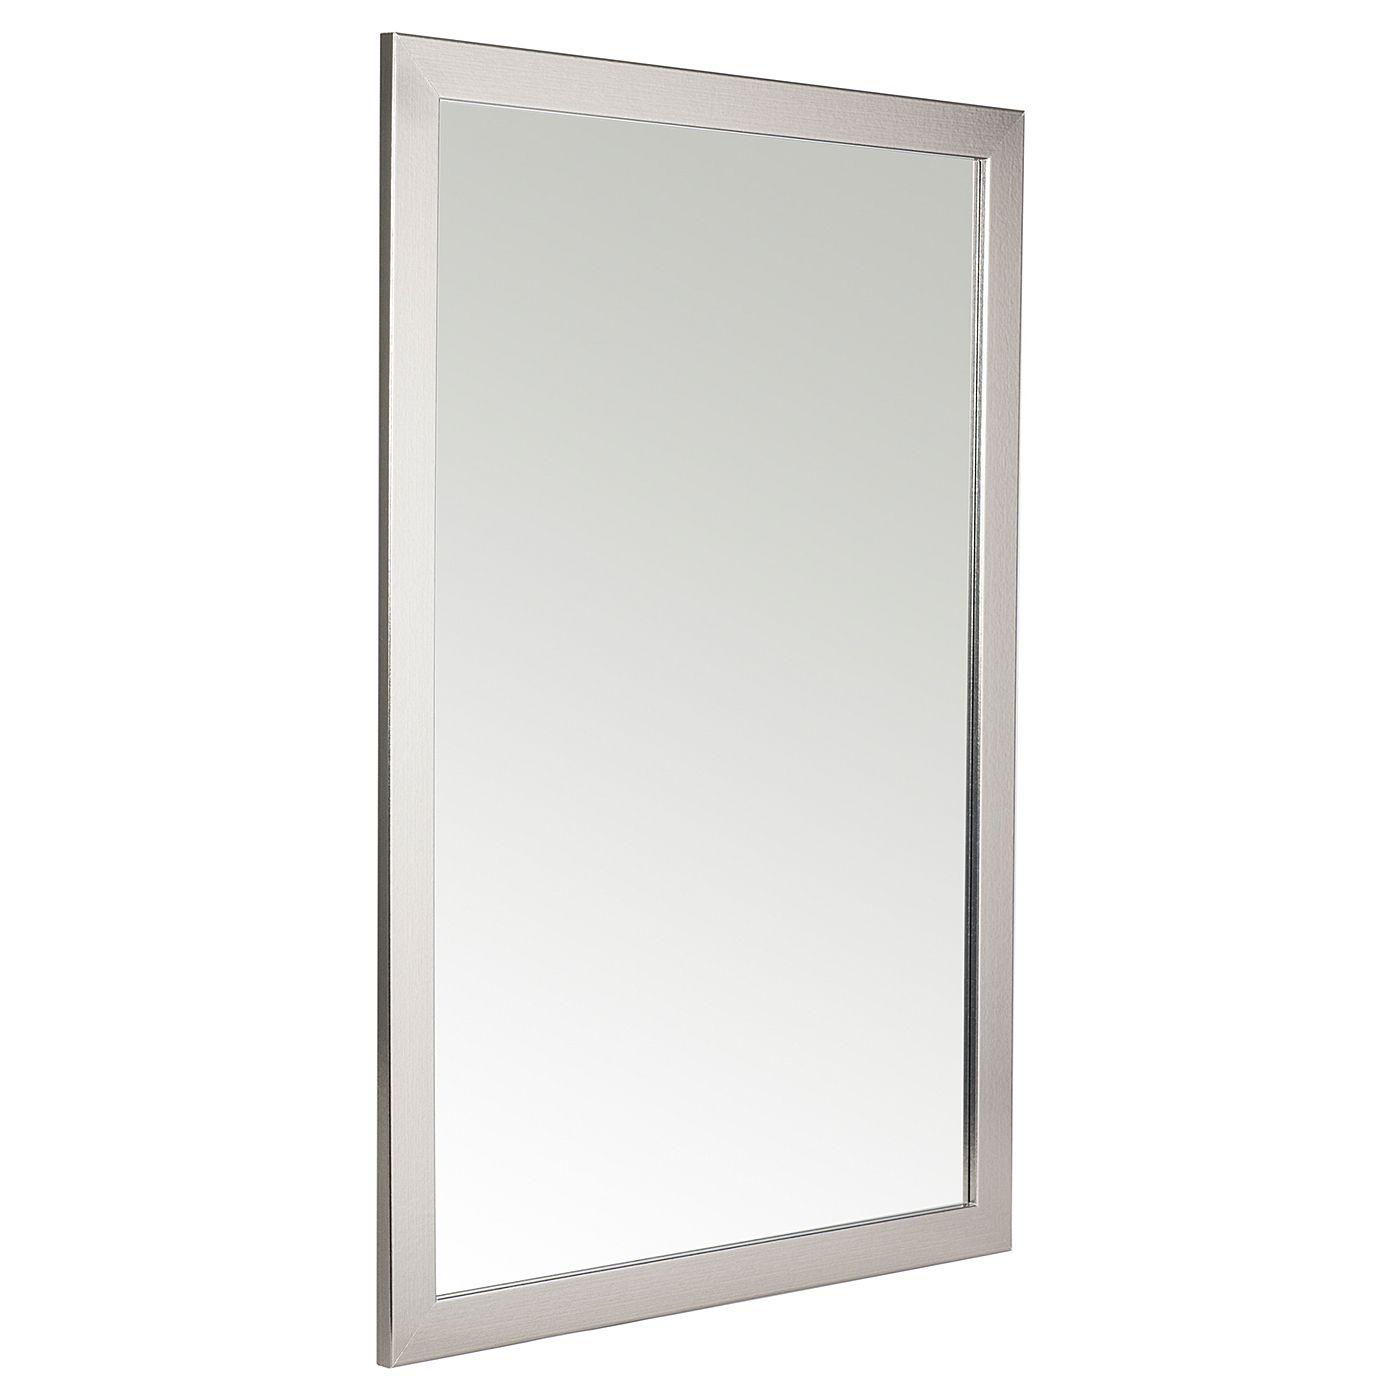 Asda Framed Mirror Pewter 83X53Cm - Mirrors - Asda Direct